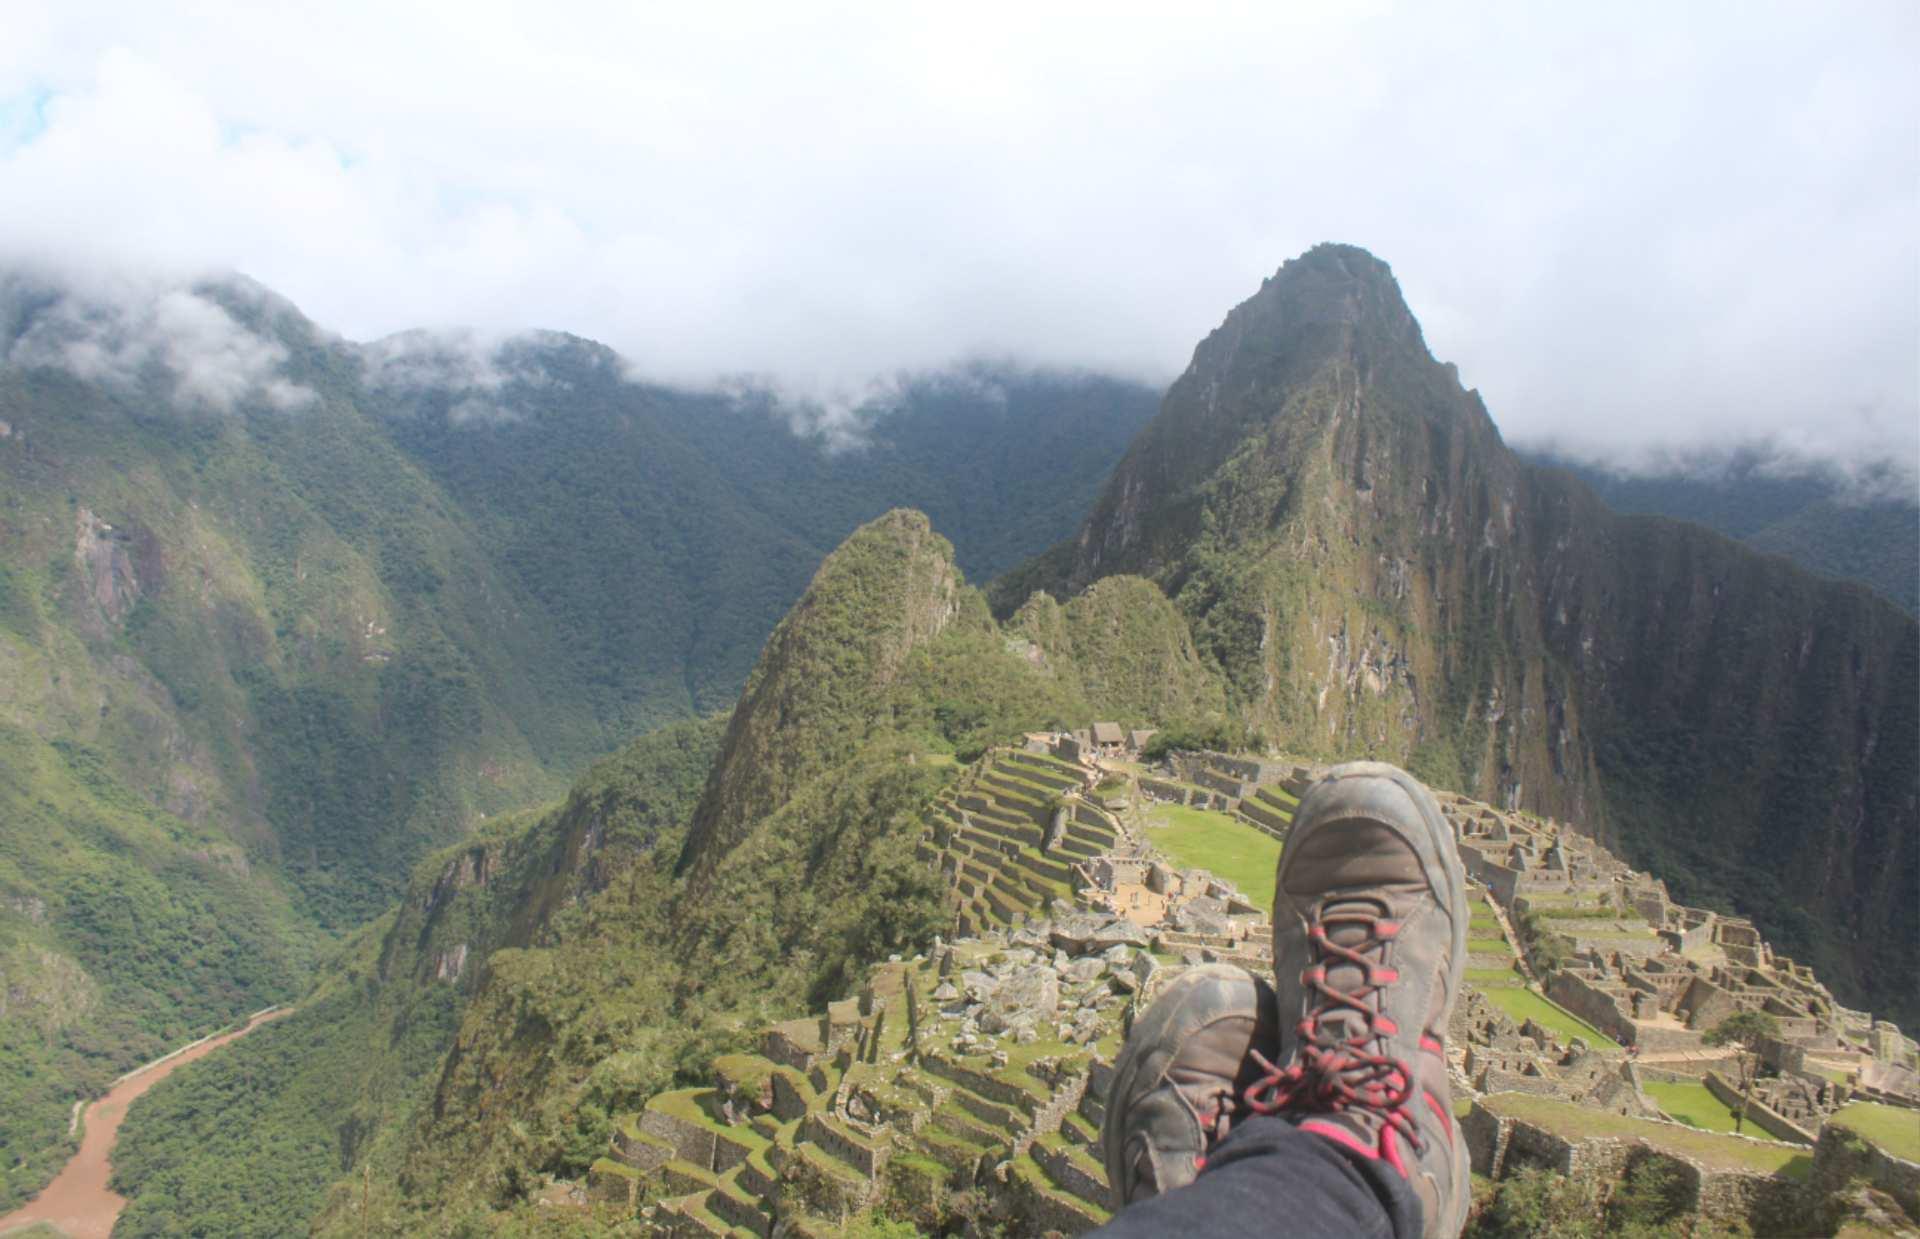 Carla Bragagnini at Machu Picchu http://infromtheoutpost.com